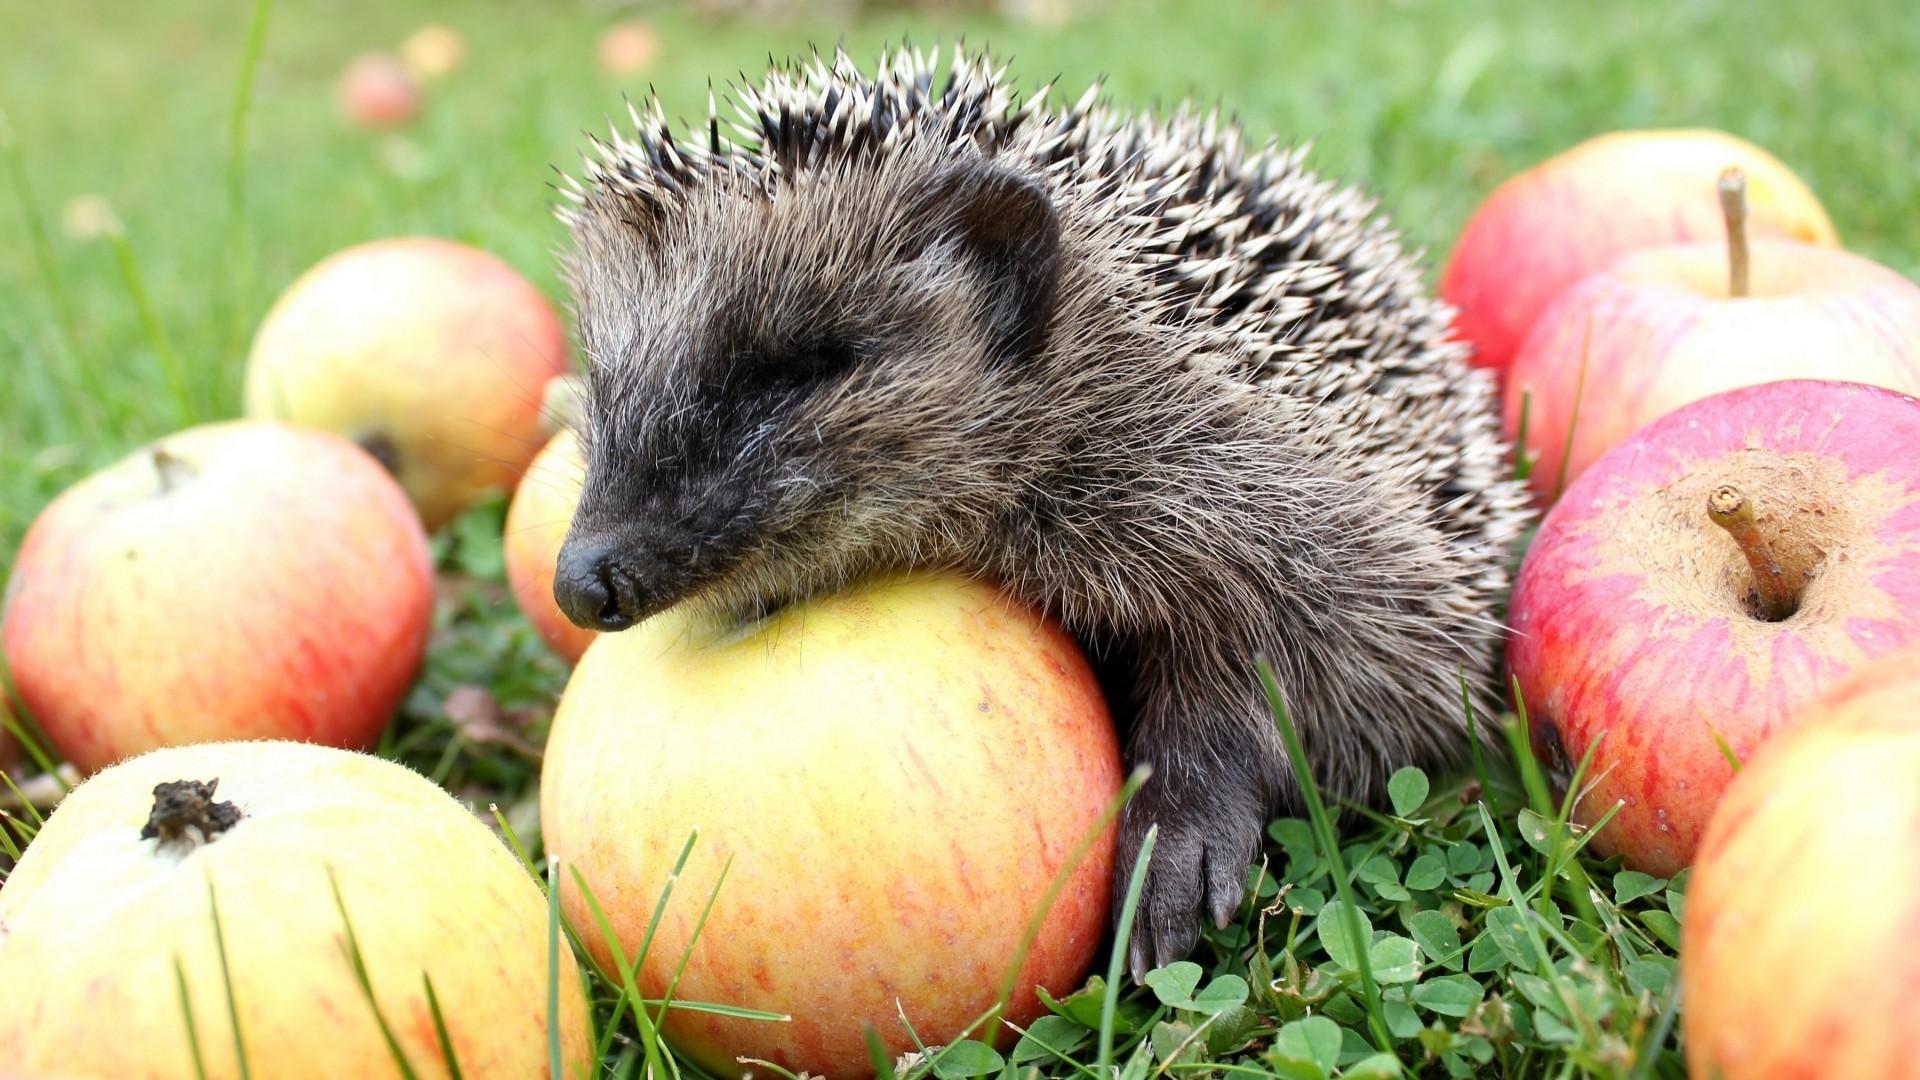 Animals_Hedgehog_sitting_on_apples_10574